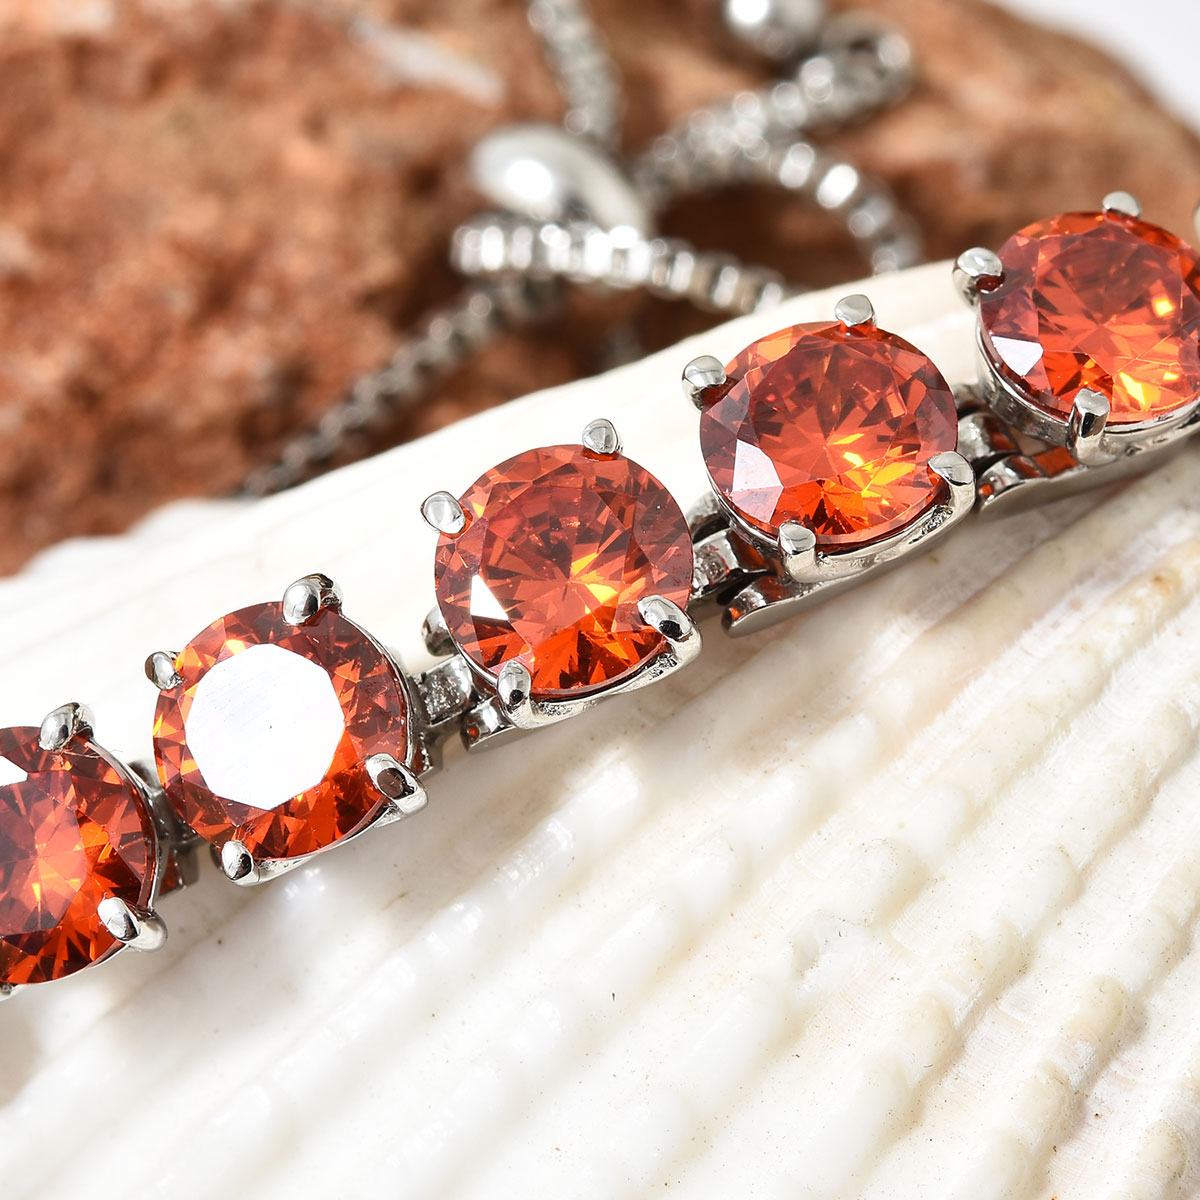 Steel-Cubic-Zirconia-CZ-Orange-Elegant-Adjustable-Bolo-Bracelet-for-Women-Ct-21 thumbnail 9